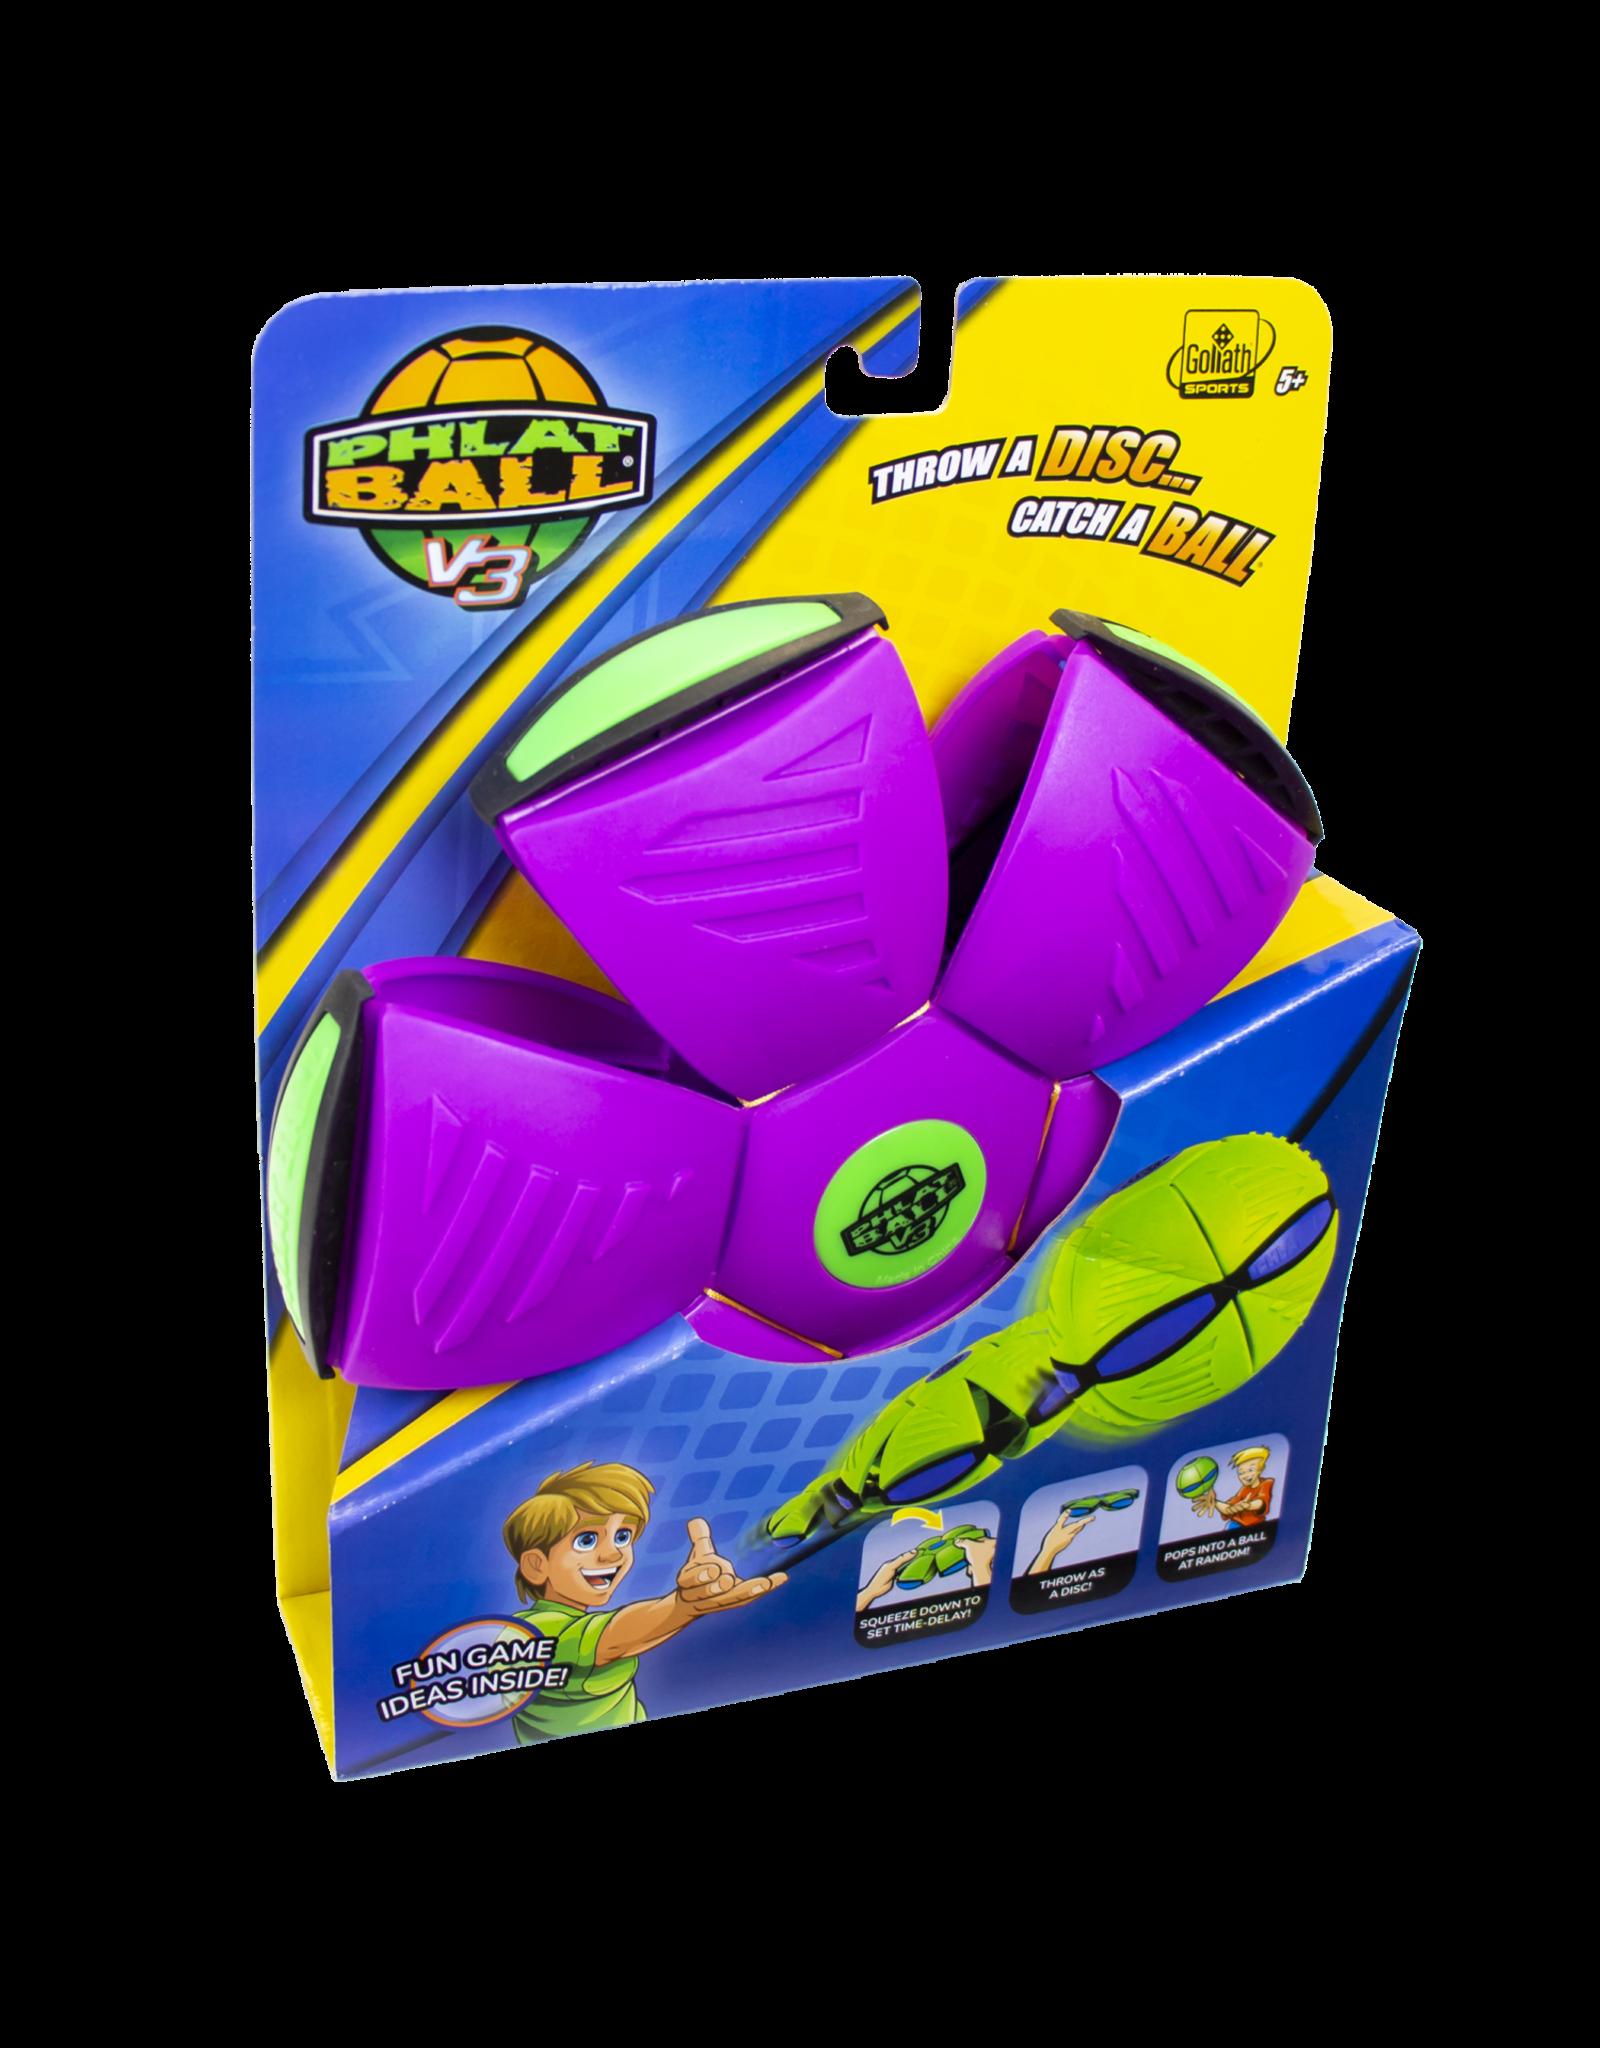 Goliath Phlat Ball™ V3